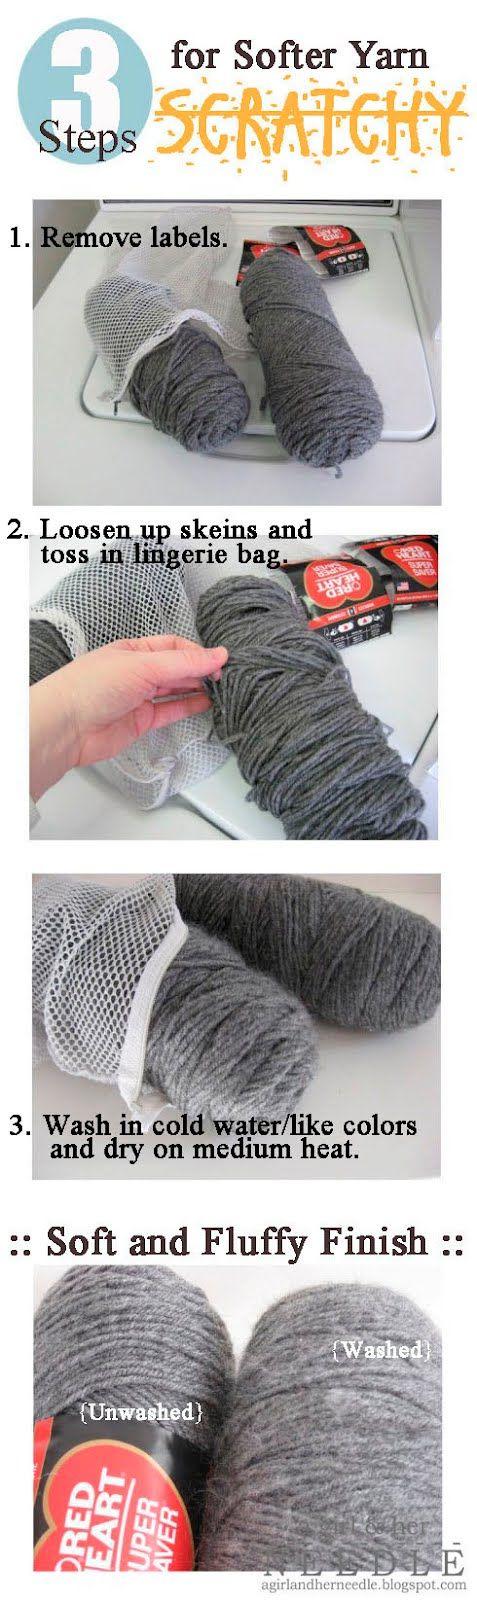 softer yarn. GENIUS!